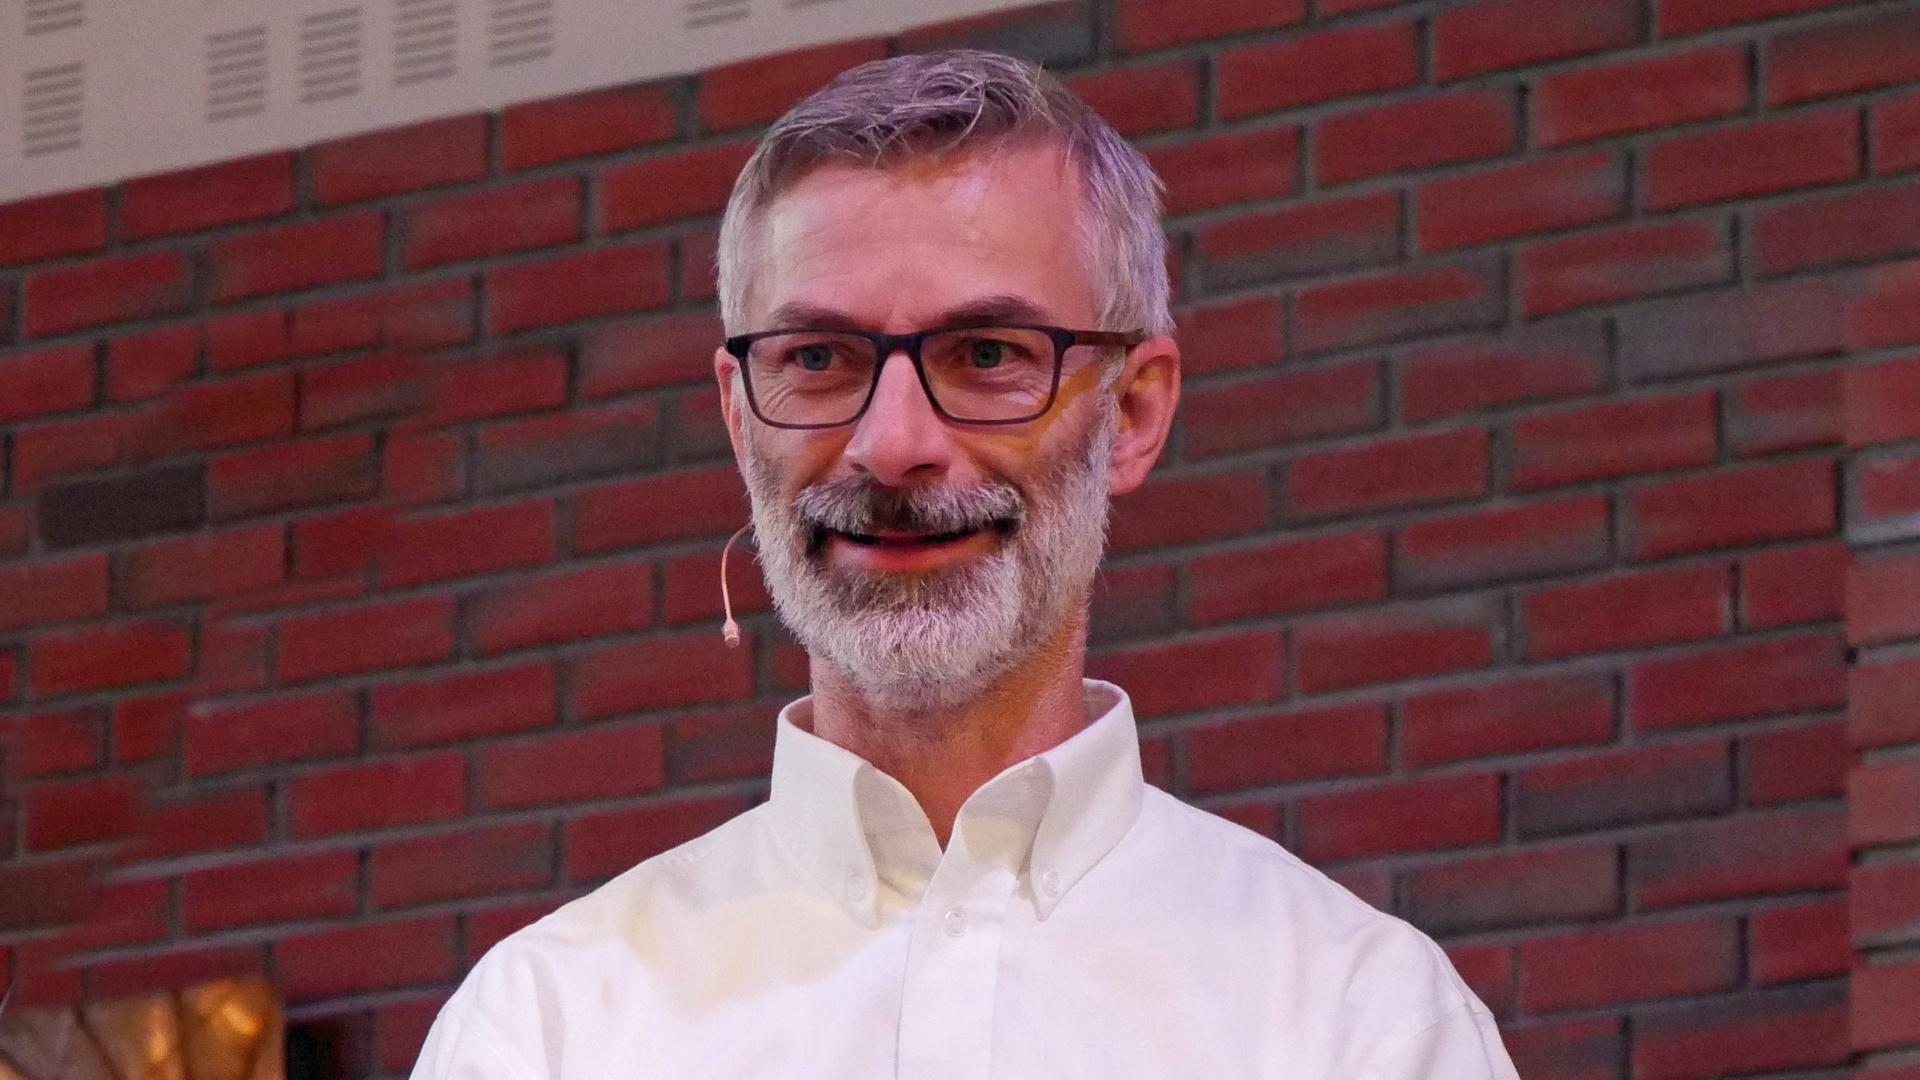 Knut Erik Skarpaas